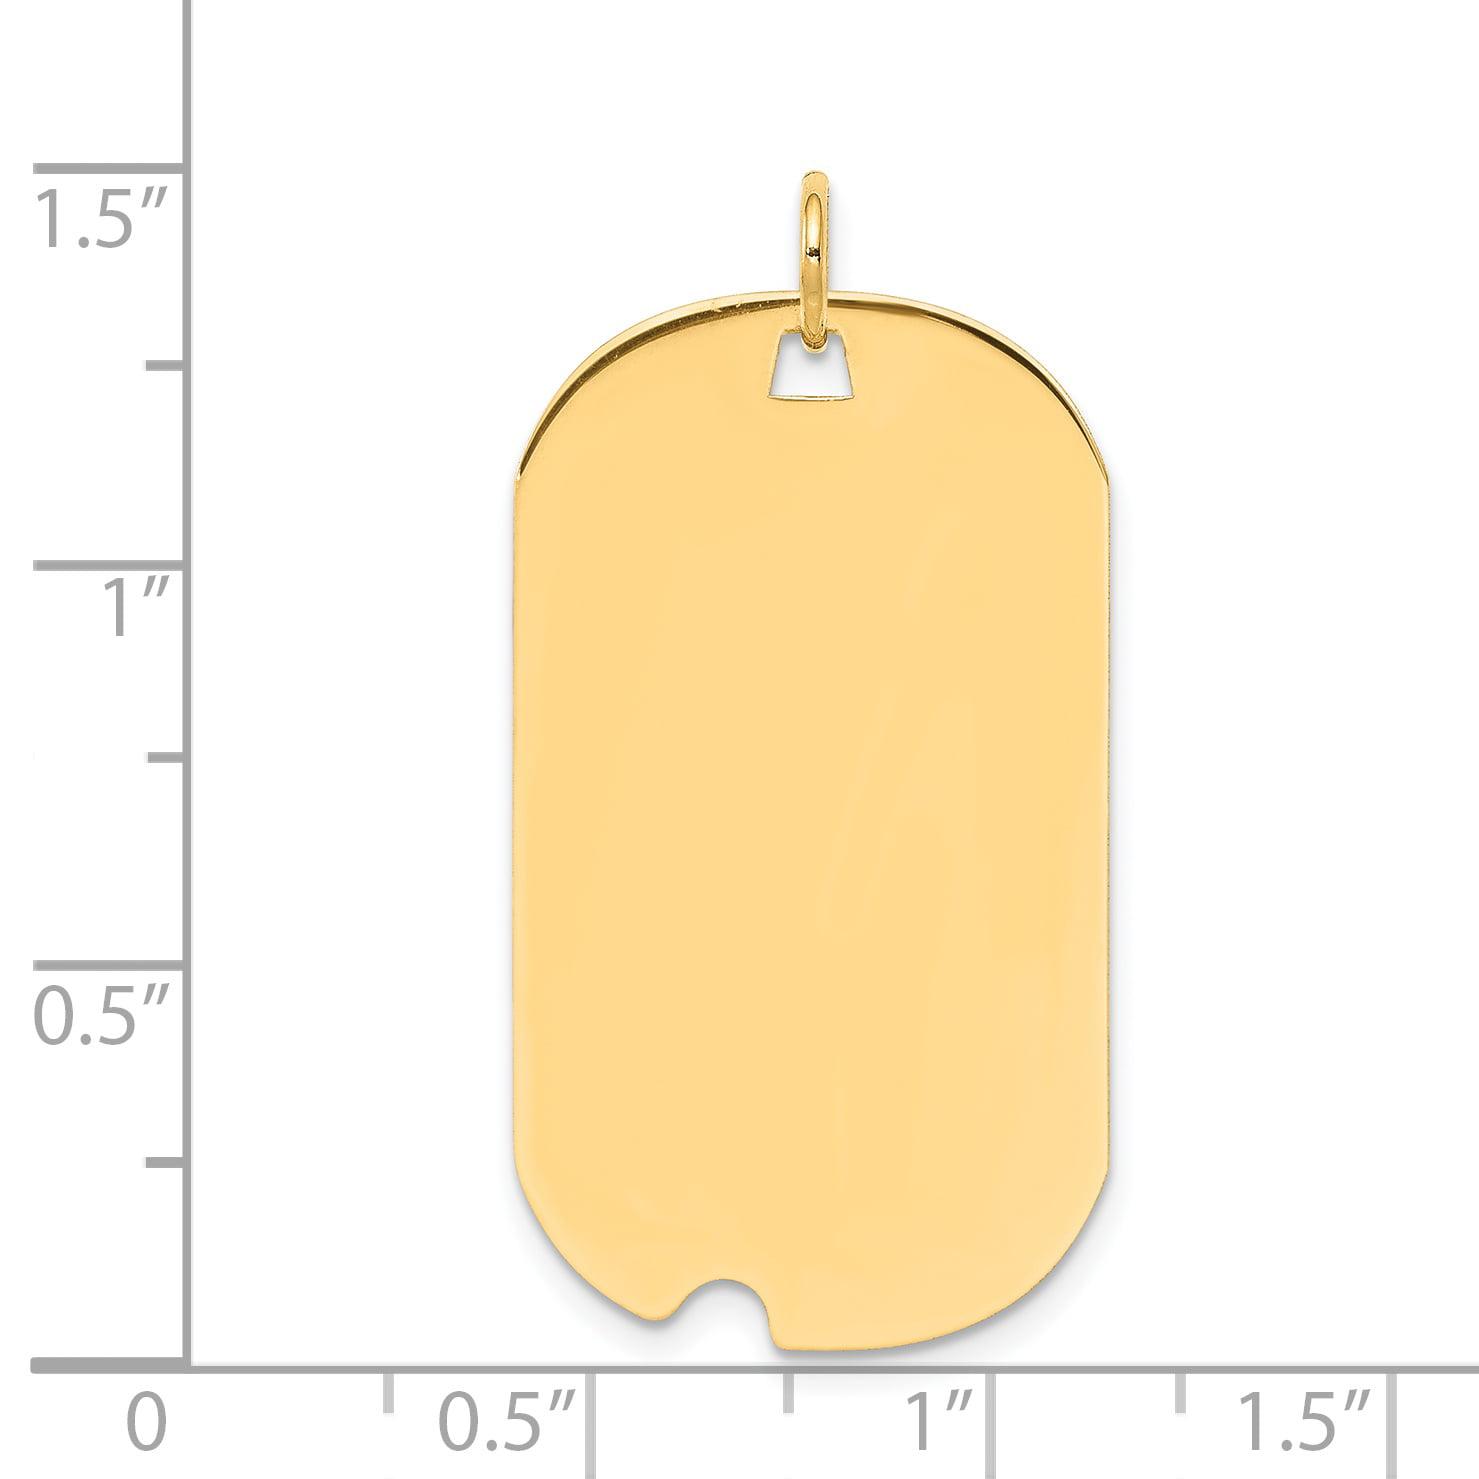 14K Yellow Gold Plain .035 Gauge Engravable Dog Tag w/Notch Disc Charm - image 1 of 2